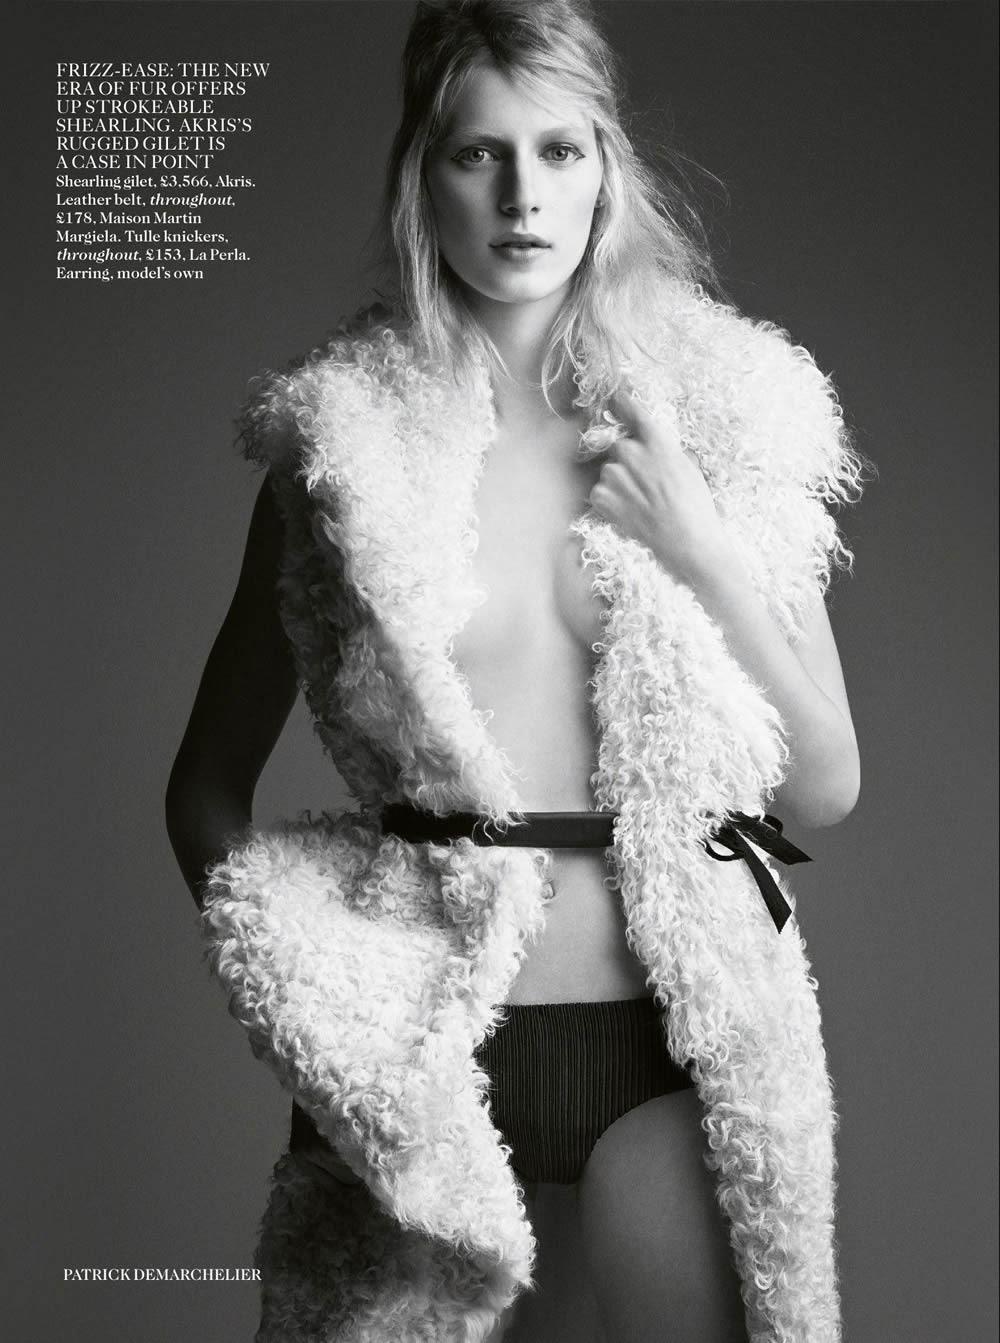 Europe Fashion Men's And Women Wears......: Julia Nobis By